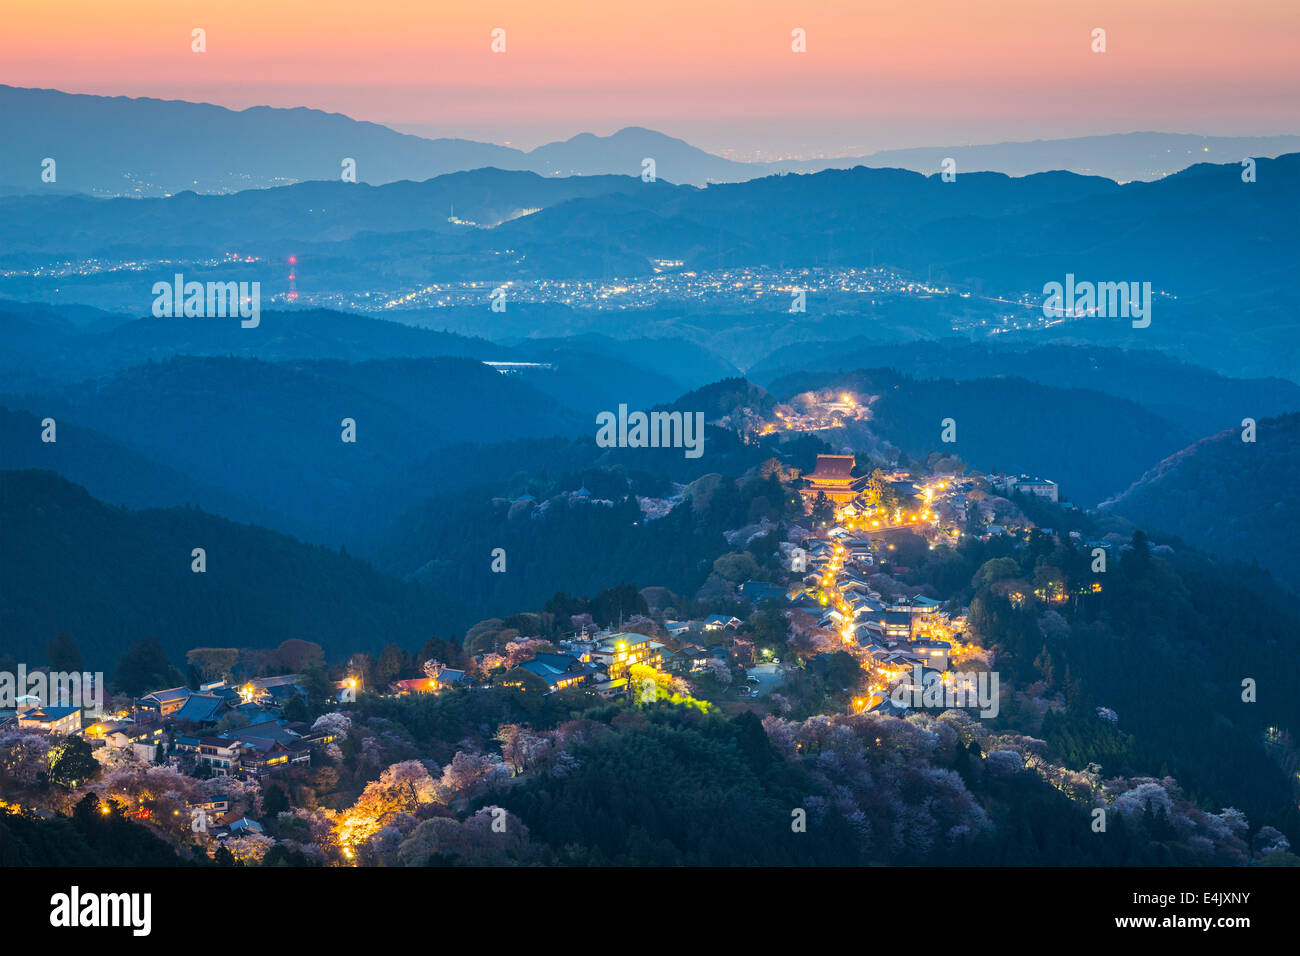 Yoshinoyama, Japan at twilight during the spring. - Stock Image